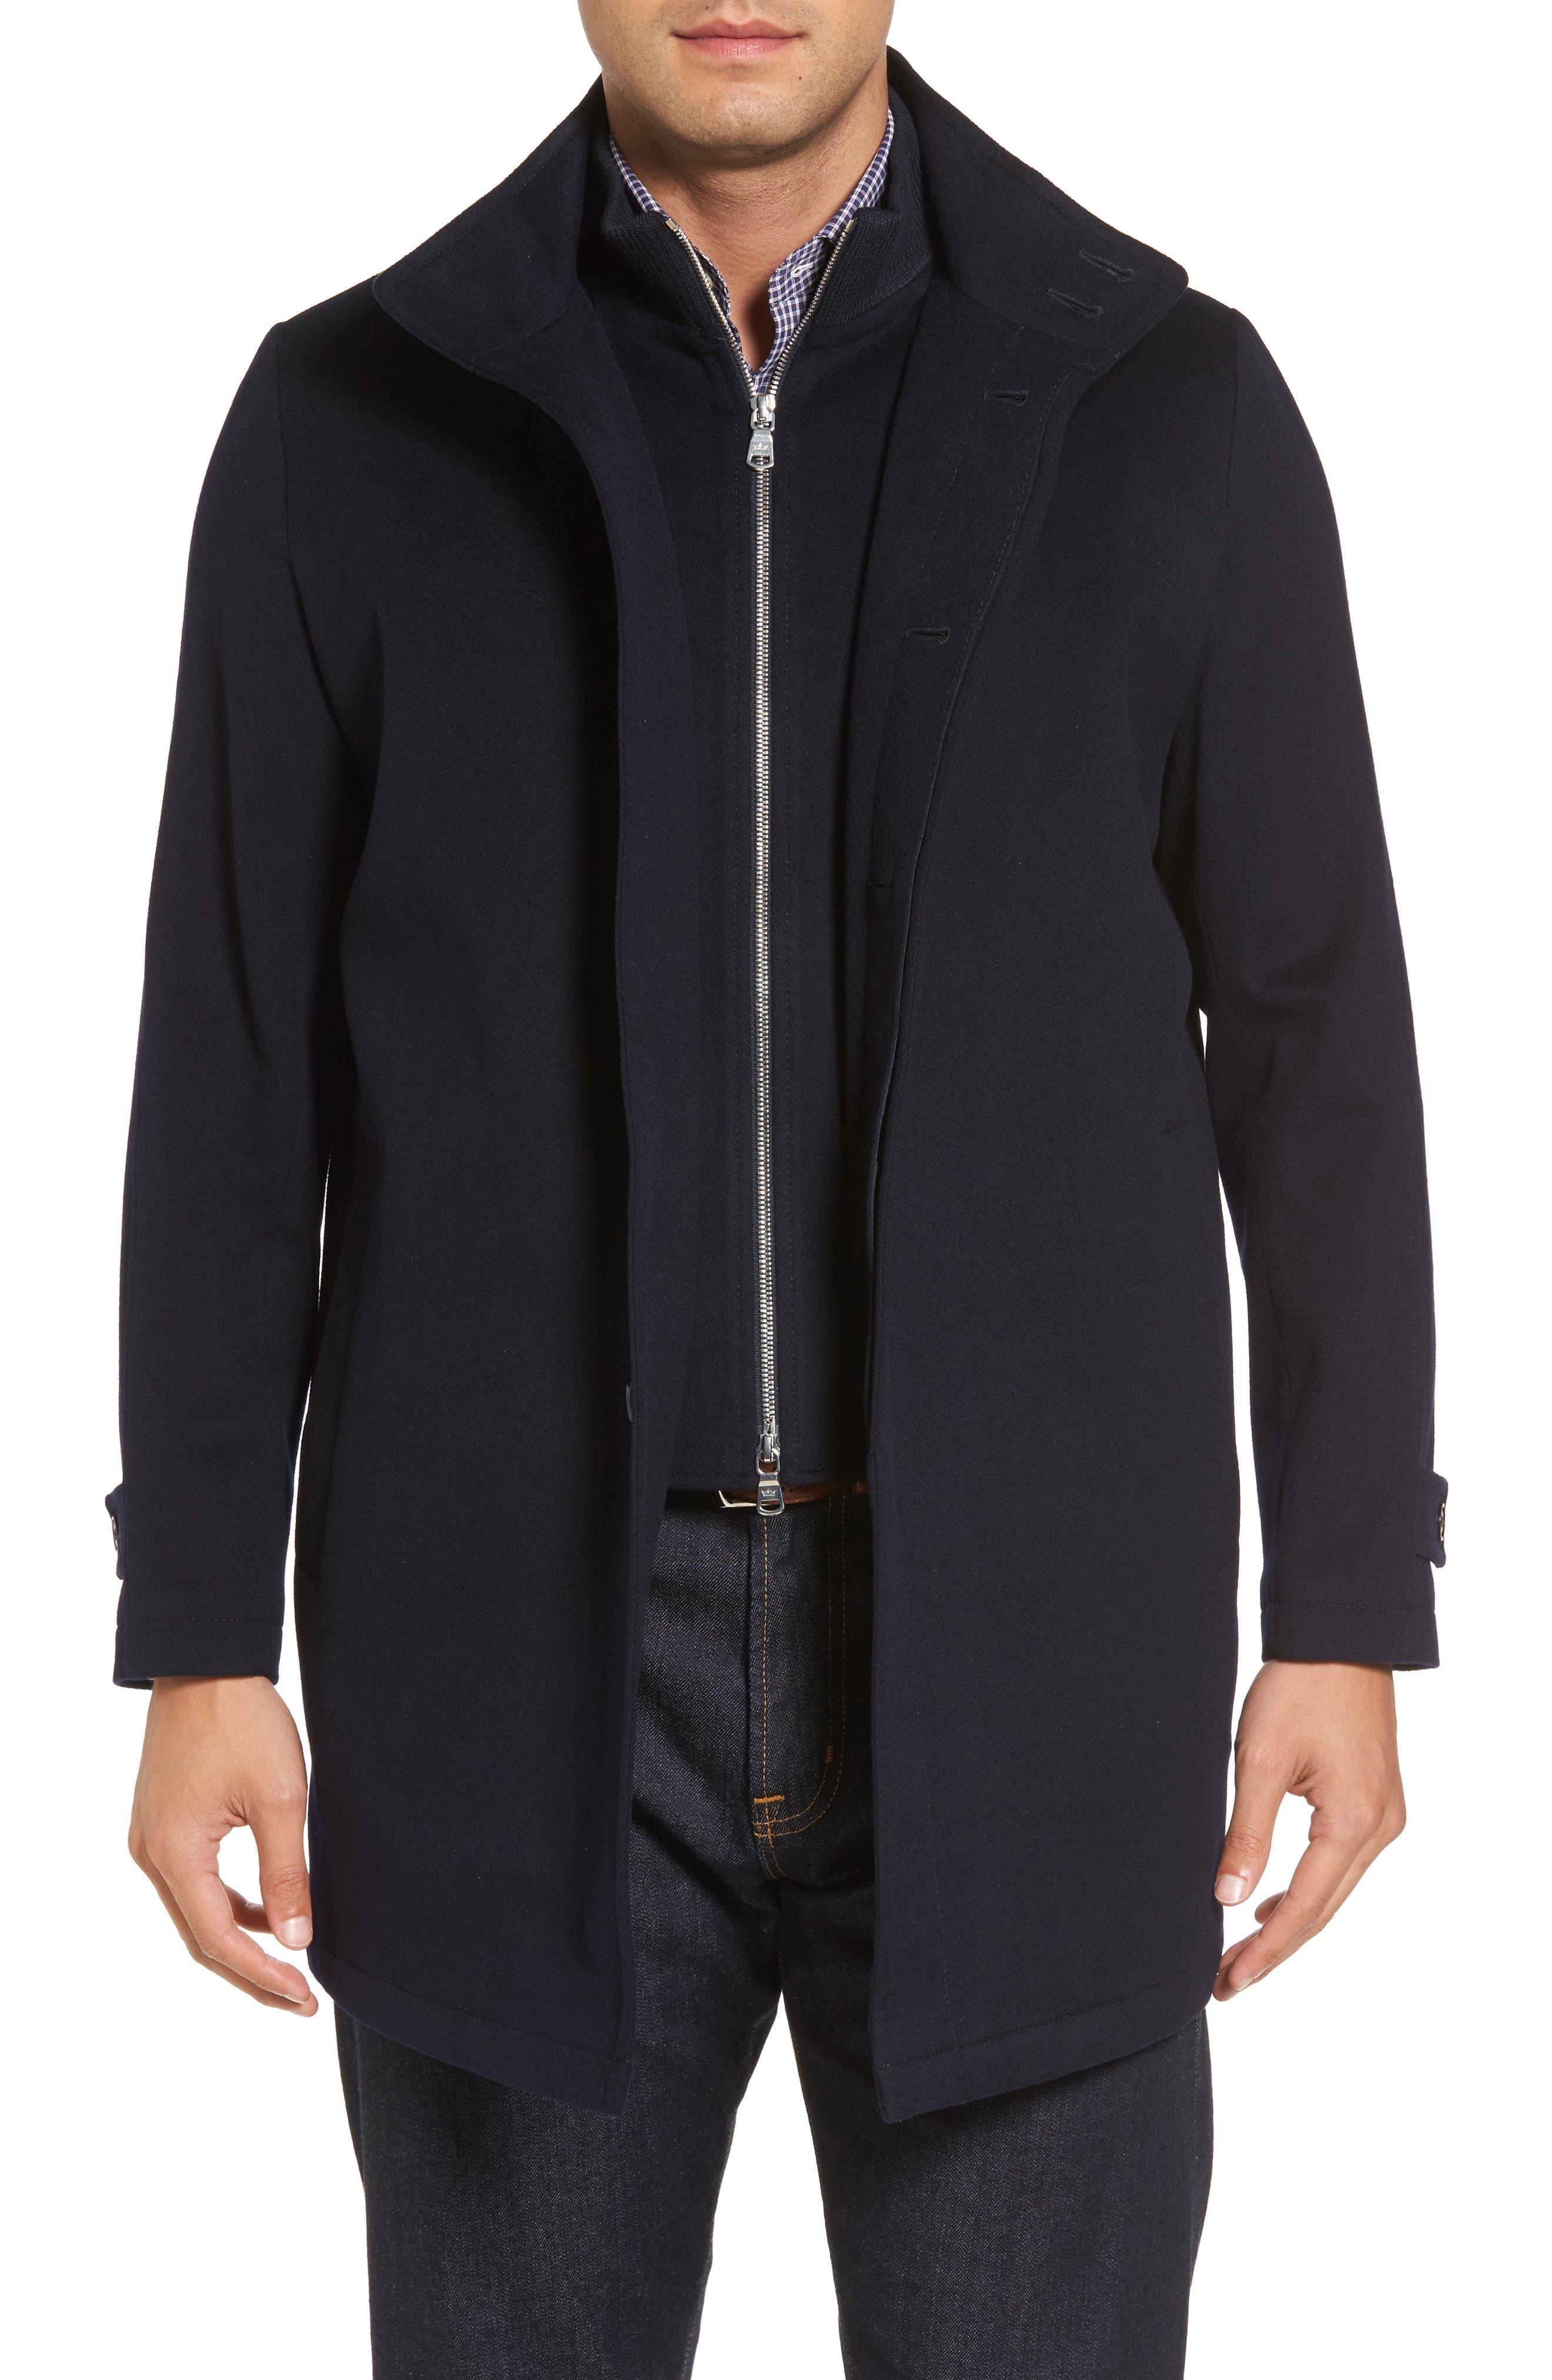 Peter Millar Horizon Wool Overcoat,                             Main thumbnail 1, color,                             001